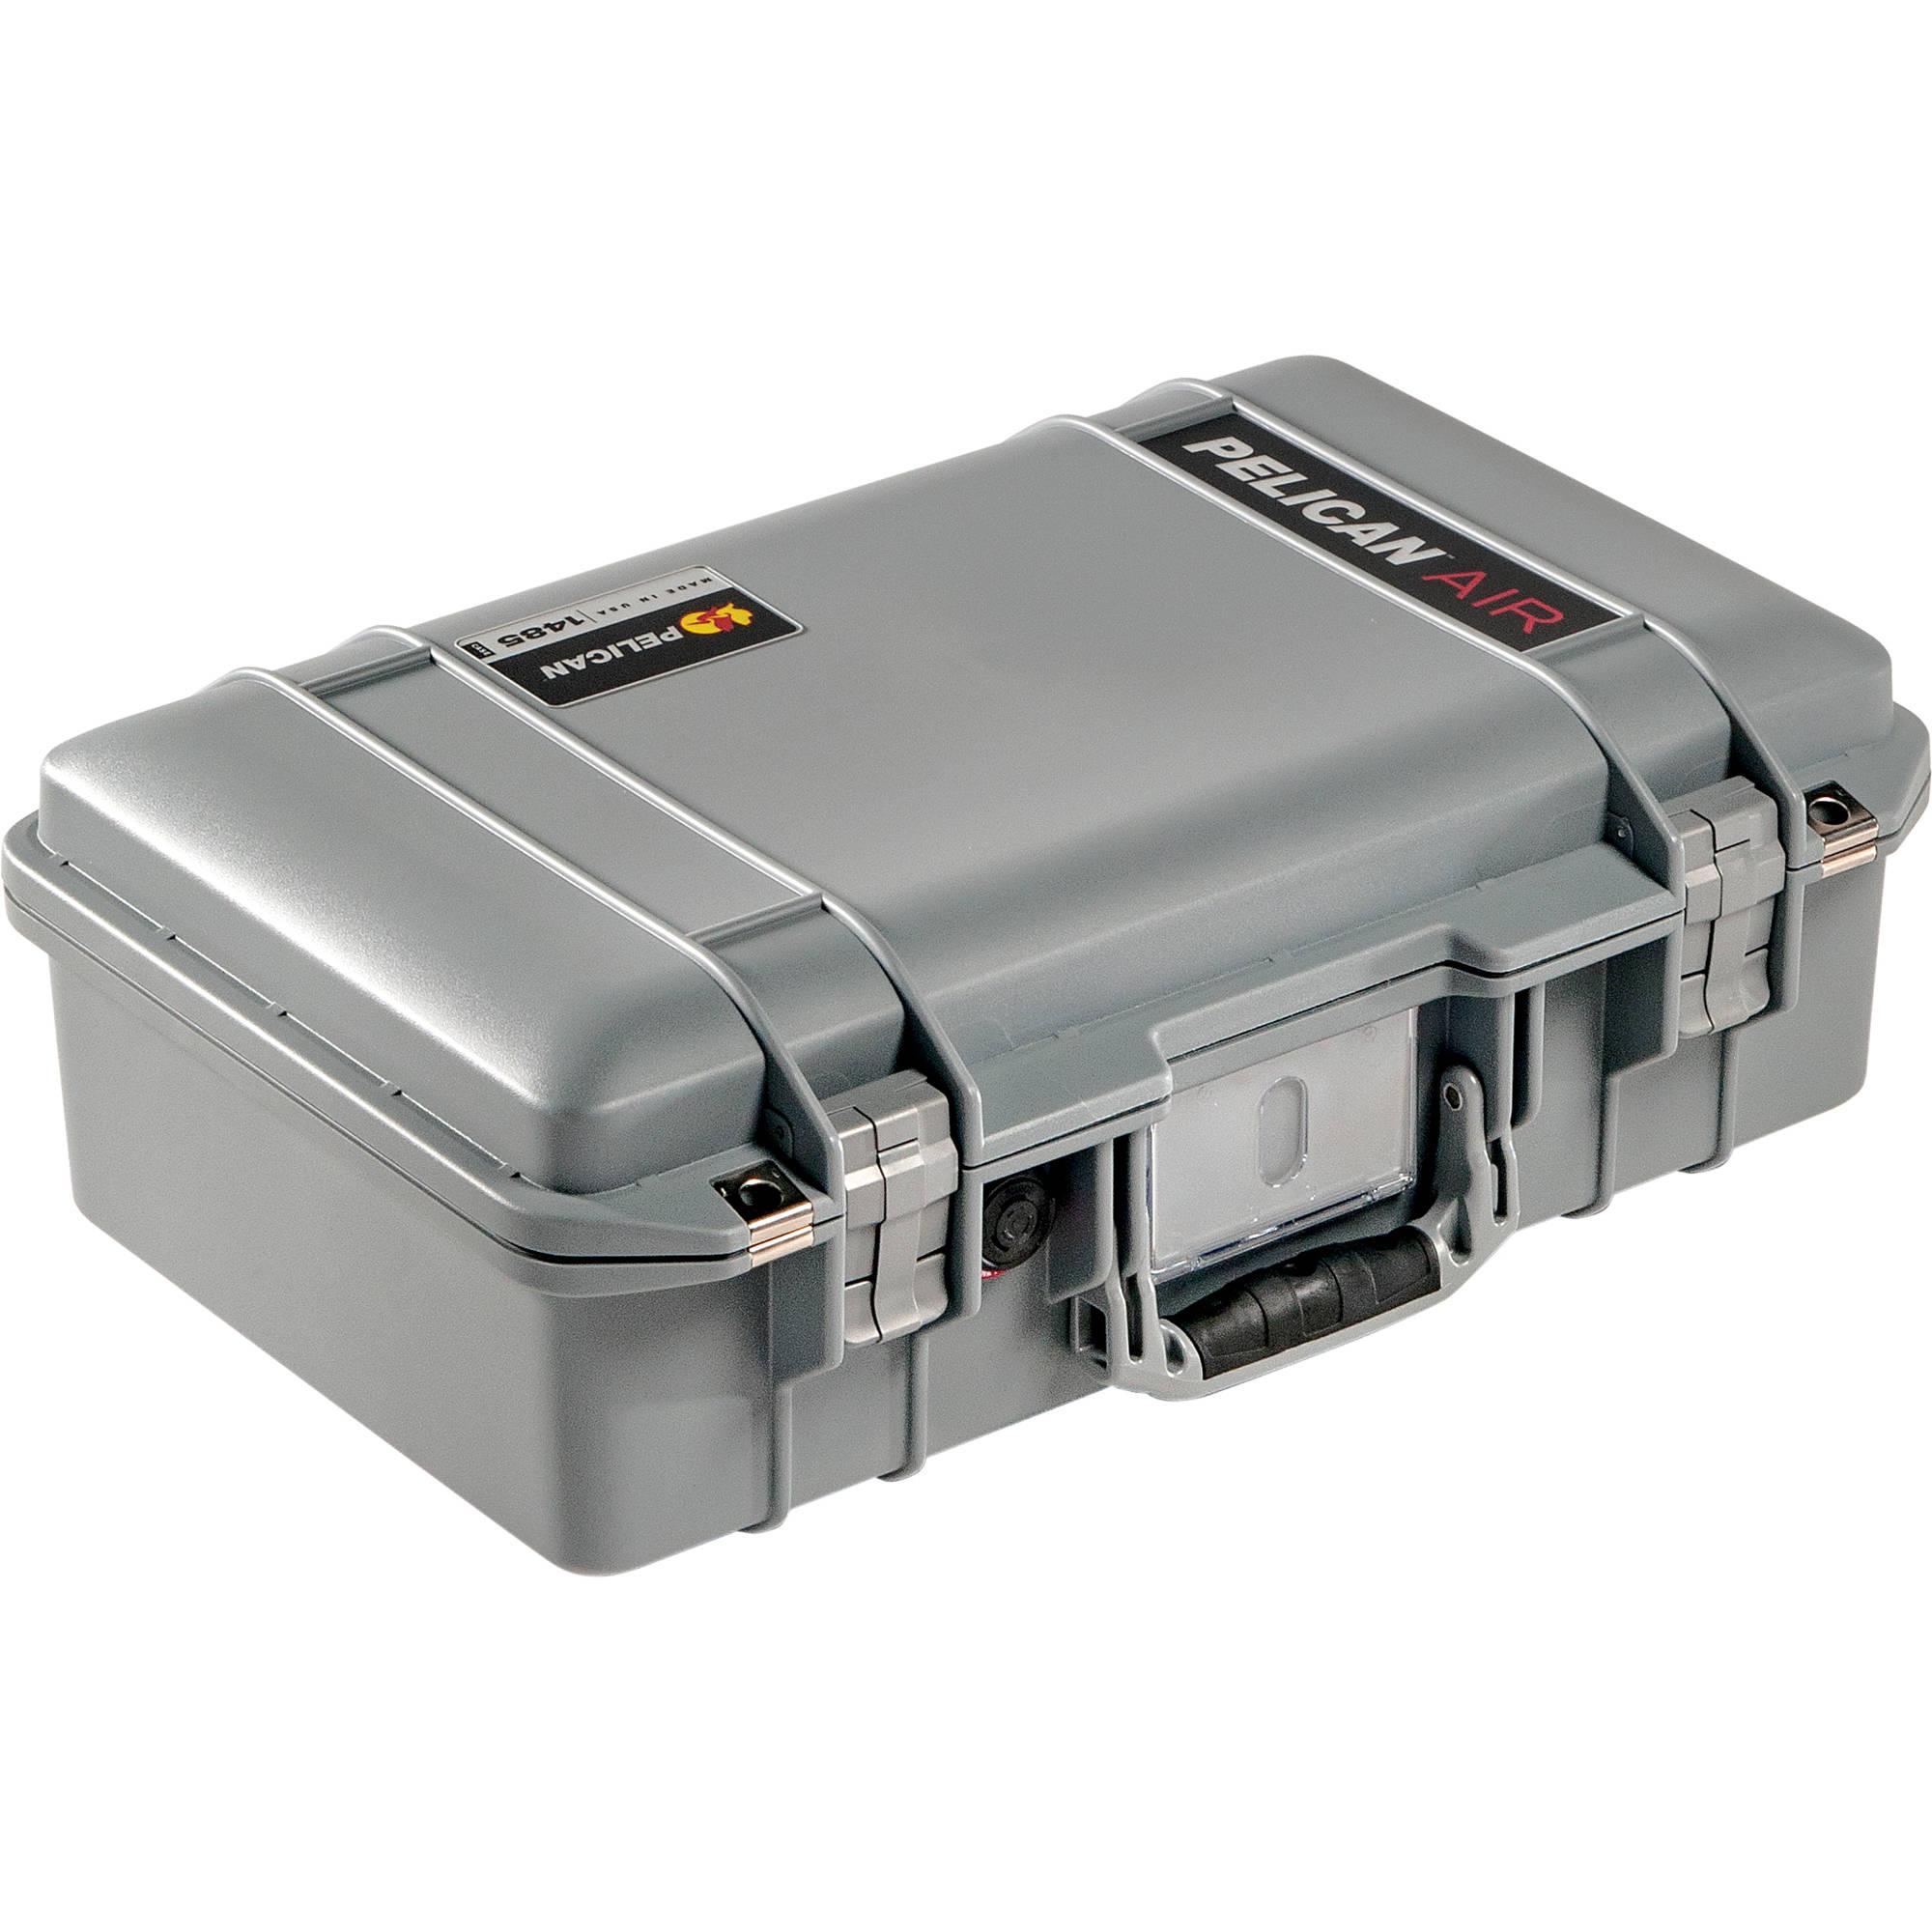 73e2b91d66 pelican 014850 0010 180 1485 air case without 1330134.jpg